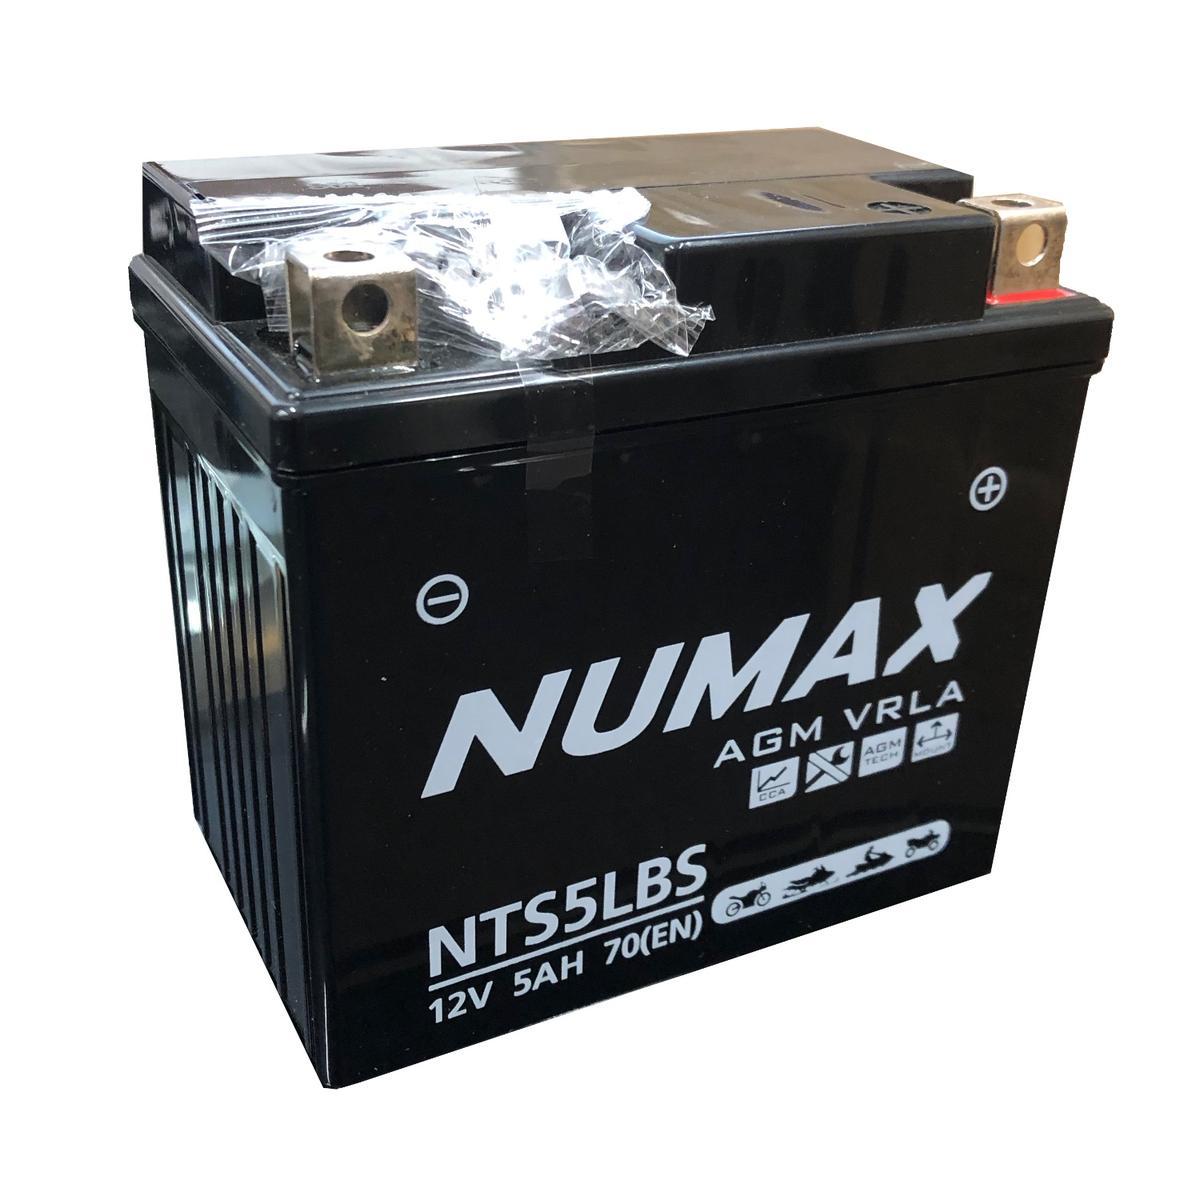 Numax 12v NTS5LBS Motorbike Bike Battery KYMCO 50cc Cobra YTX5L-4